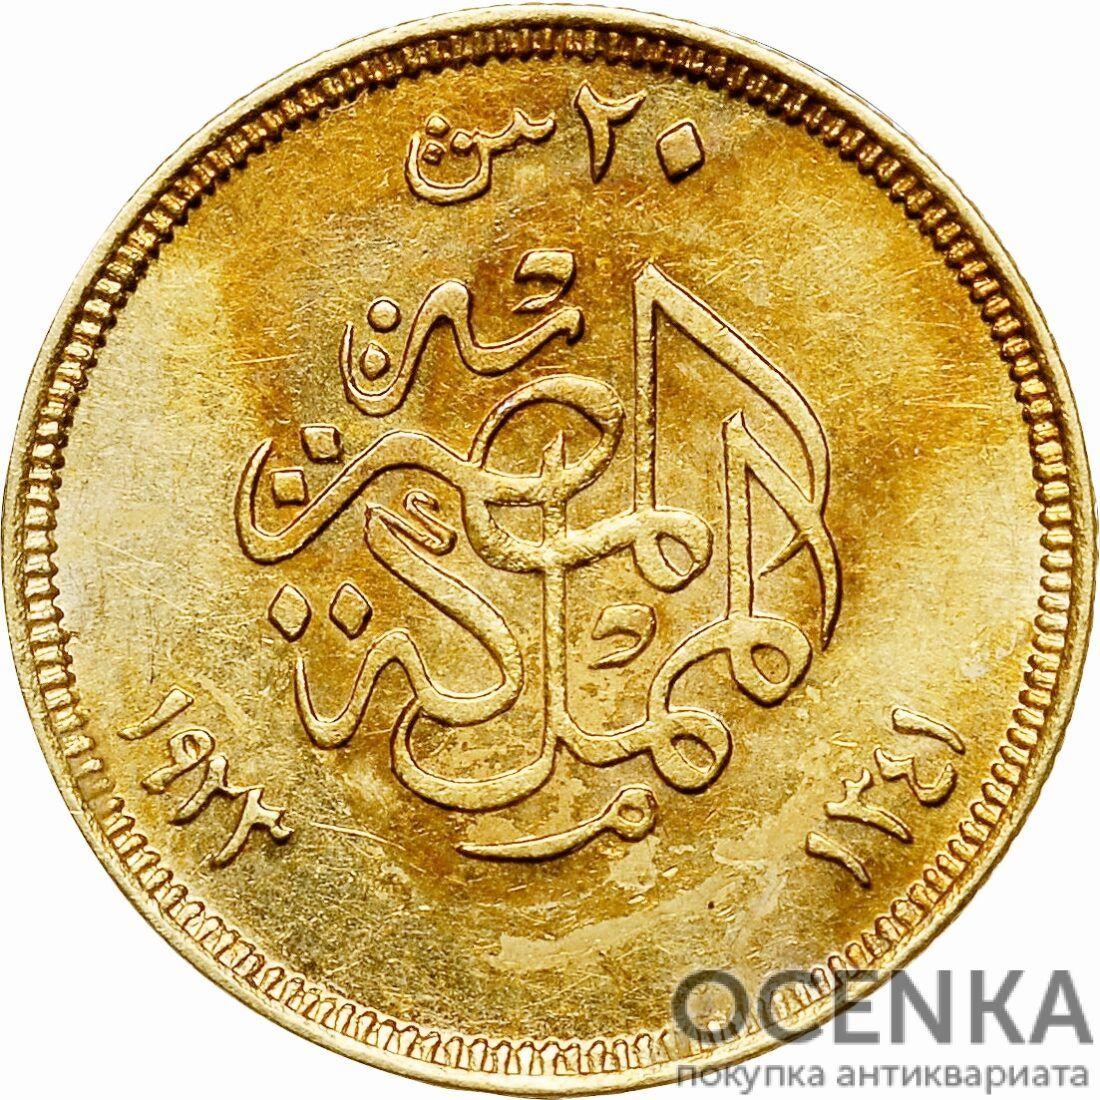 Золотая монета 20 Пиастров, Кирш (20 Piastres, Qirsh) Египет - 2